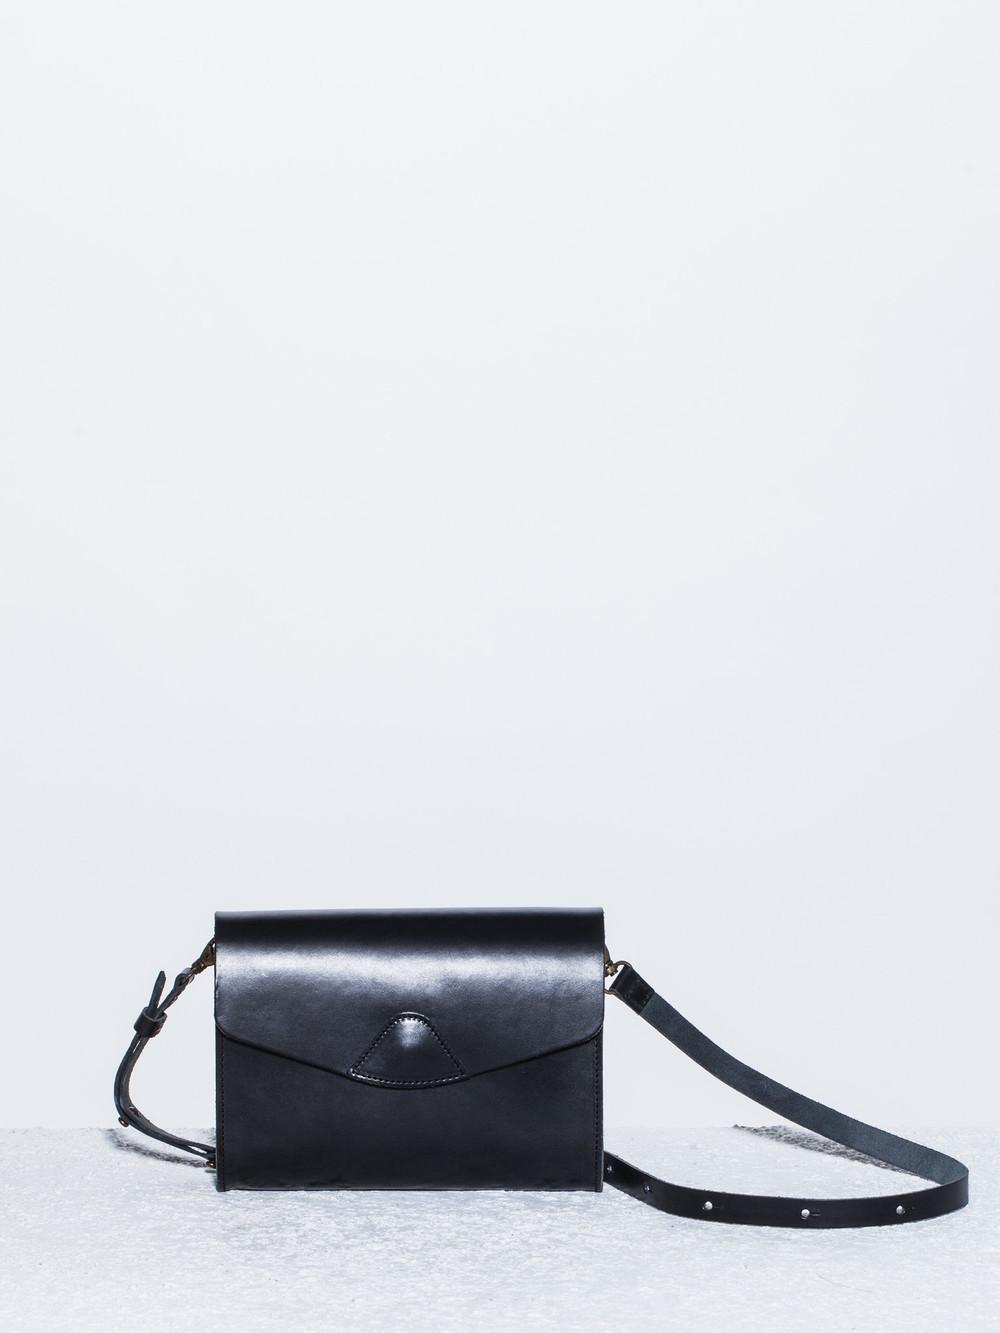 Vere-Verto-Mini-Mox-Bag-Black-Front-The-Drive-New-York.jpg